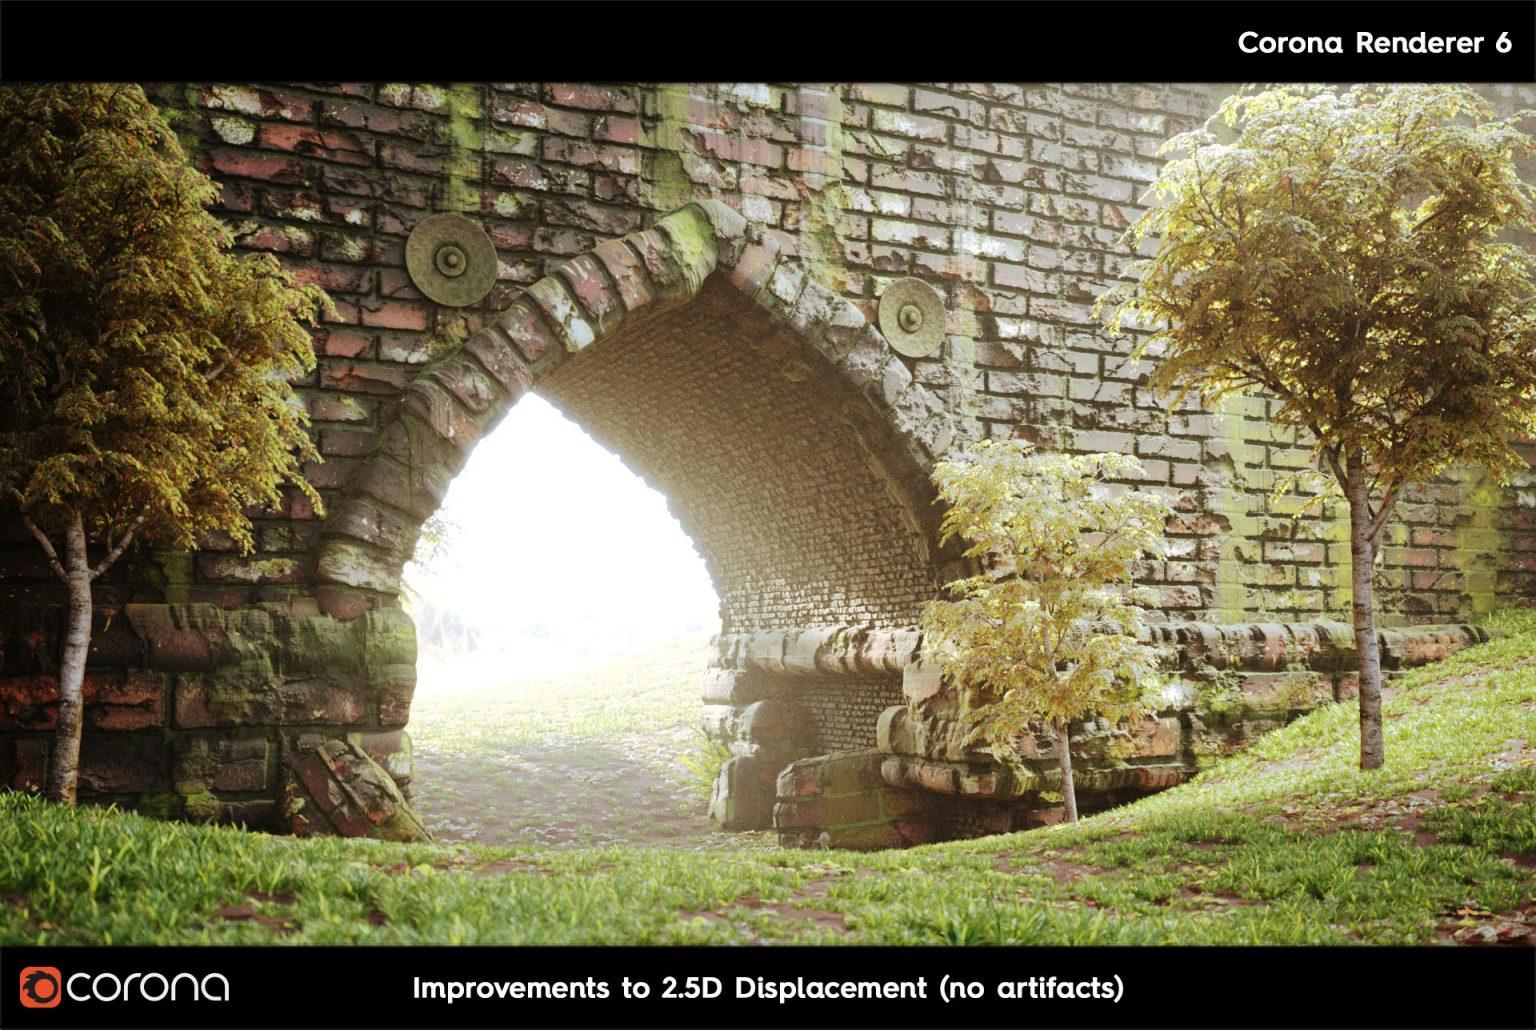 Corona Renderer 7: TUTTE LE NOVITA' - 2.D Displacement arch B